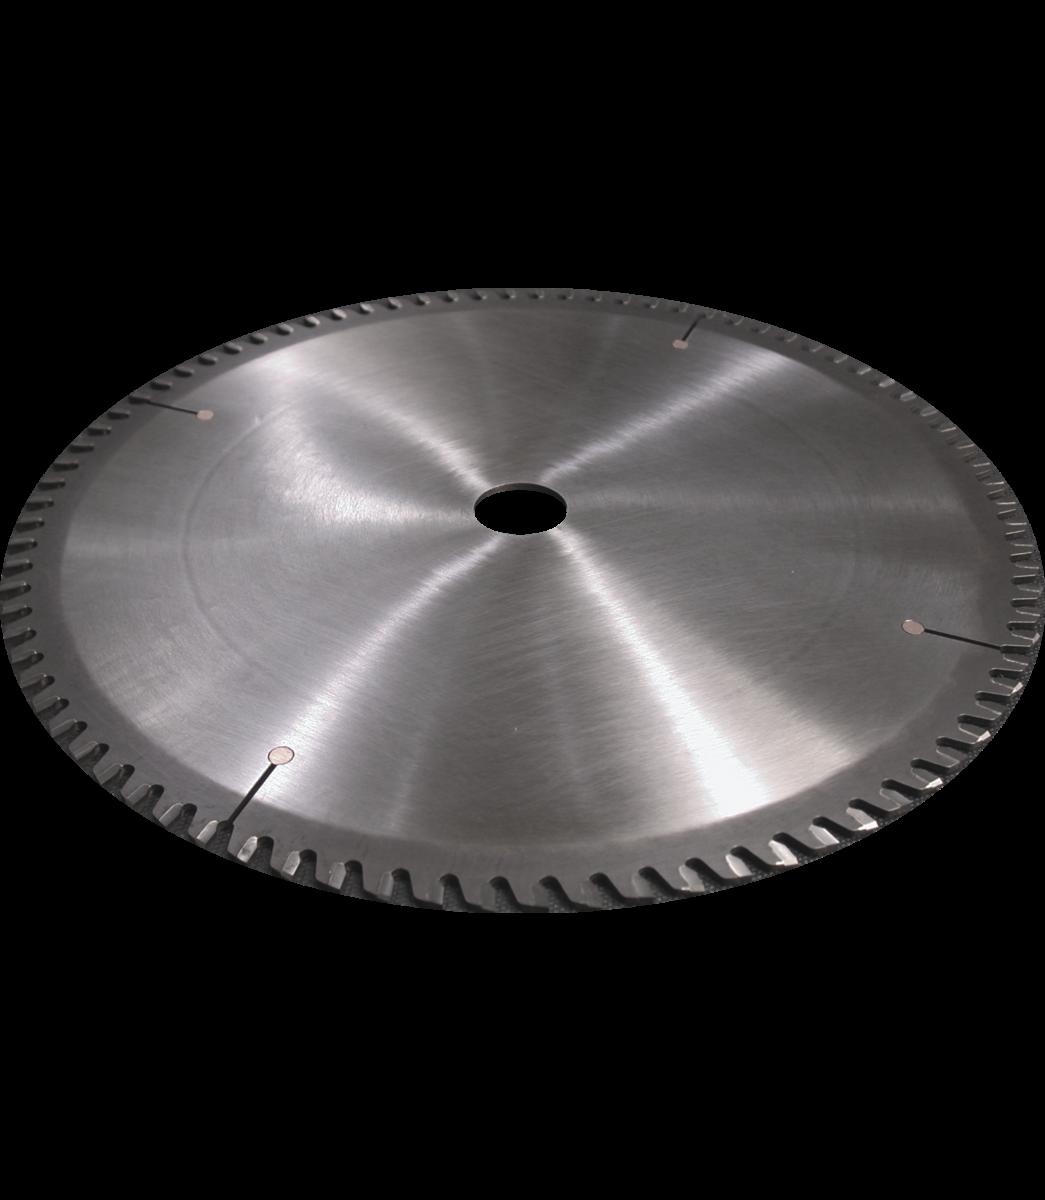 Hoja de sierra circular 350 mm x 2.5 mm x 32 mm x 220T